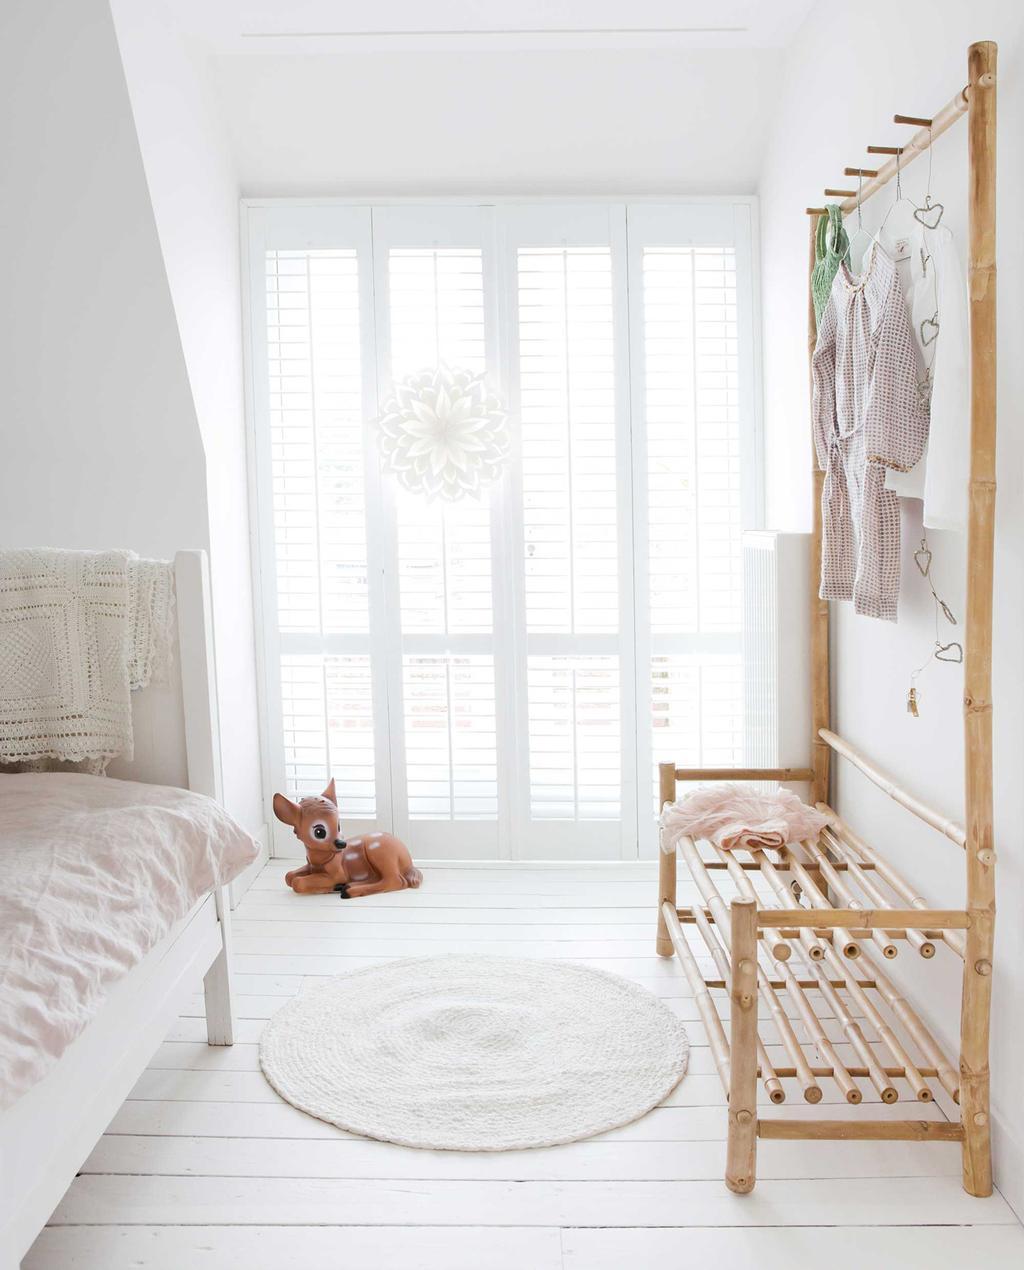 slaapkamer met wit rond vloerkleed en houten kledingrek